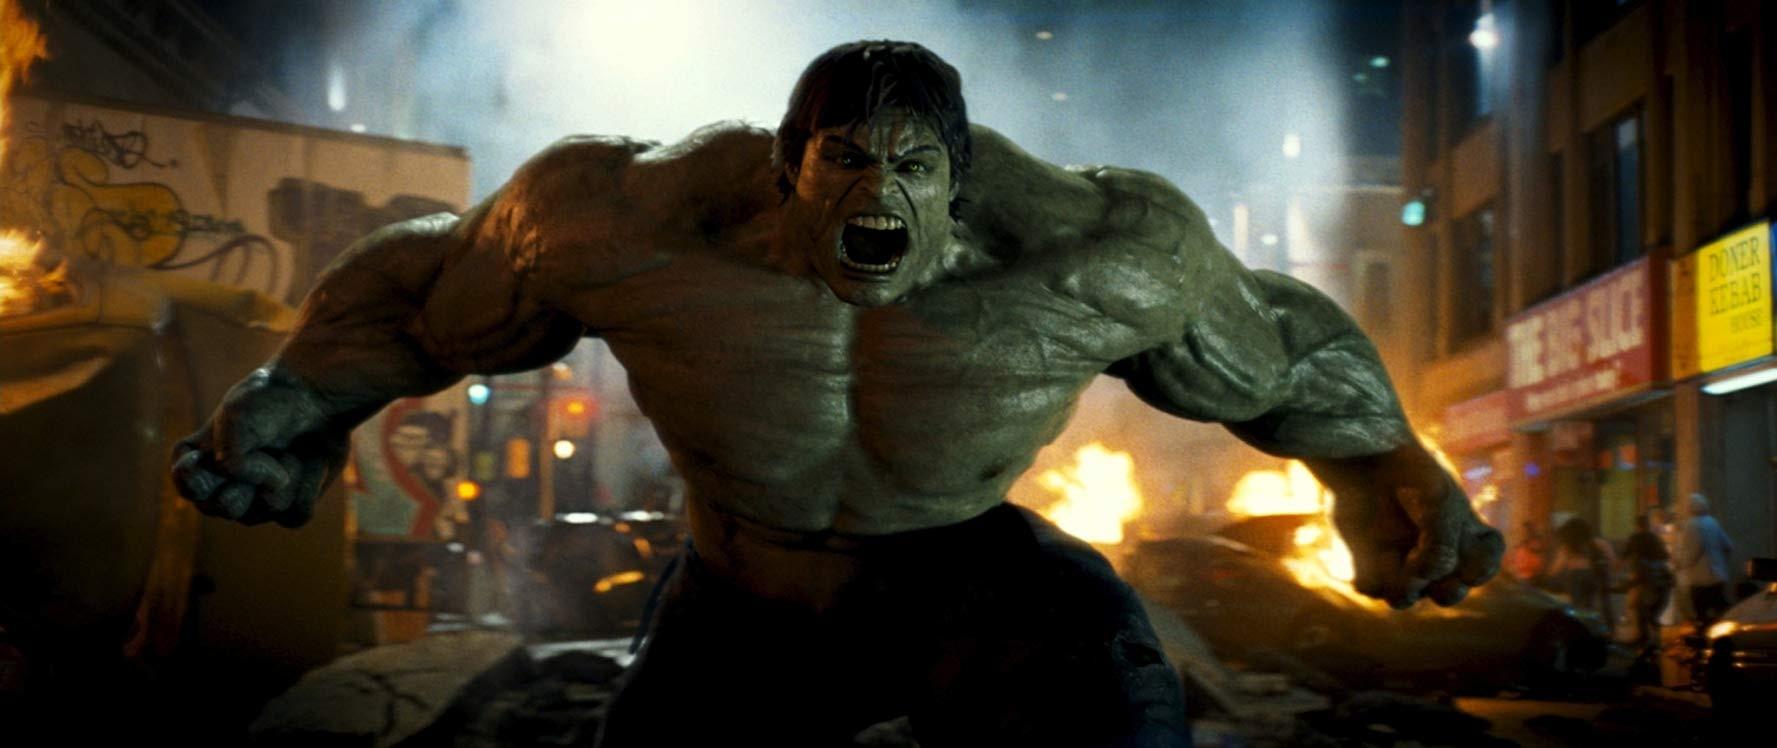 hulk 2008 full movie in hindi download 720p